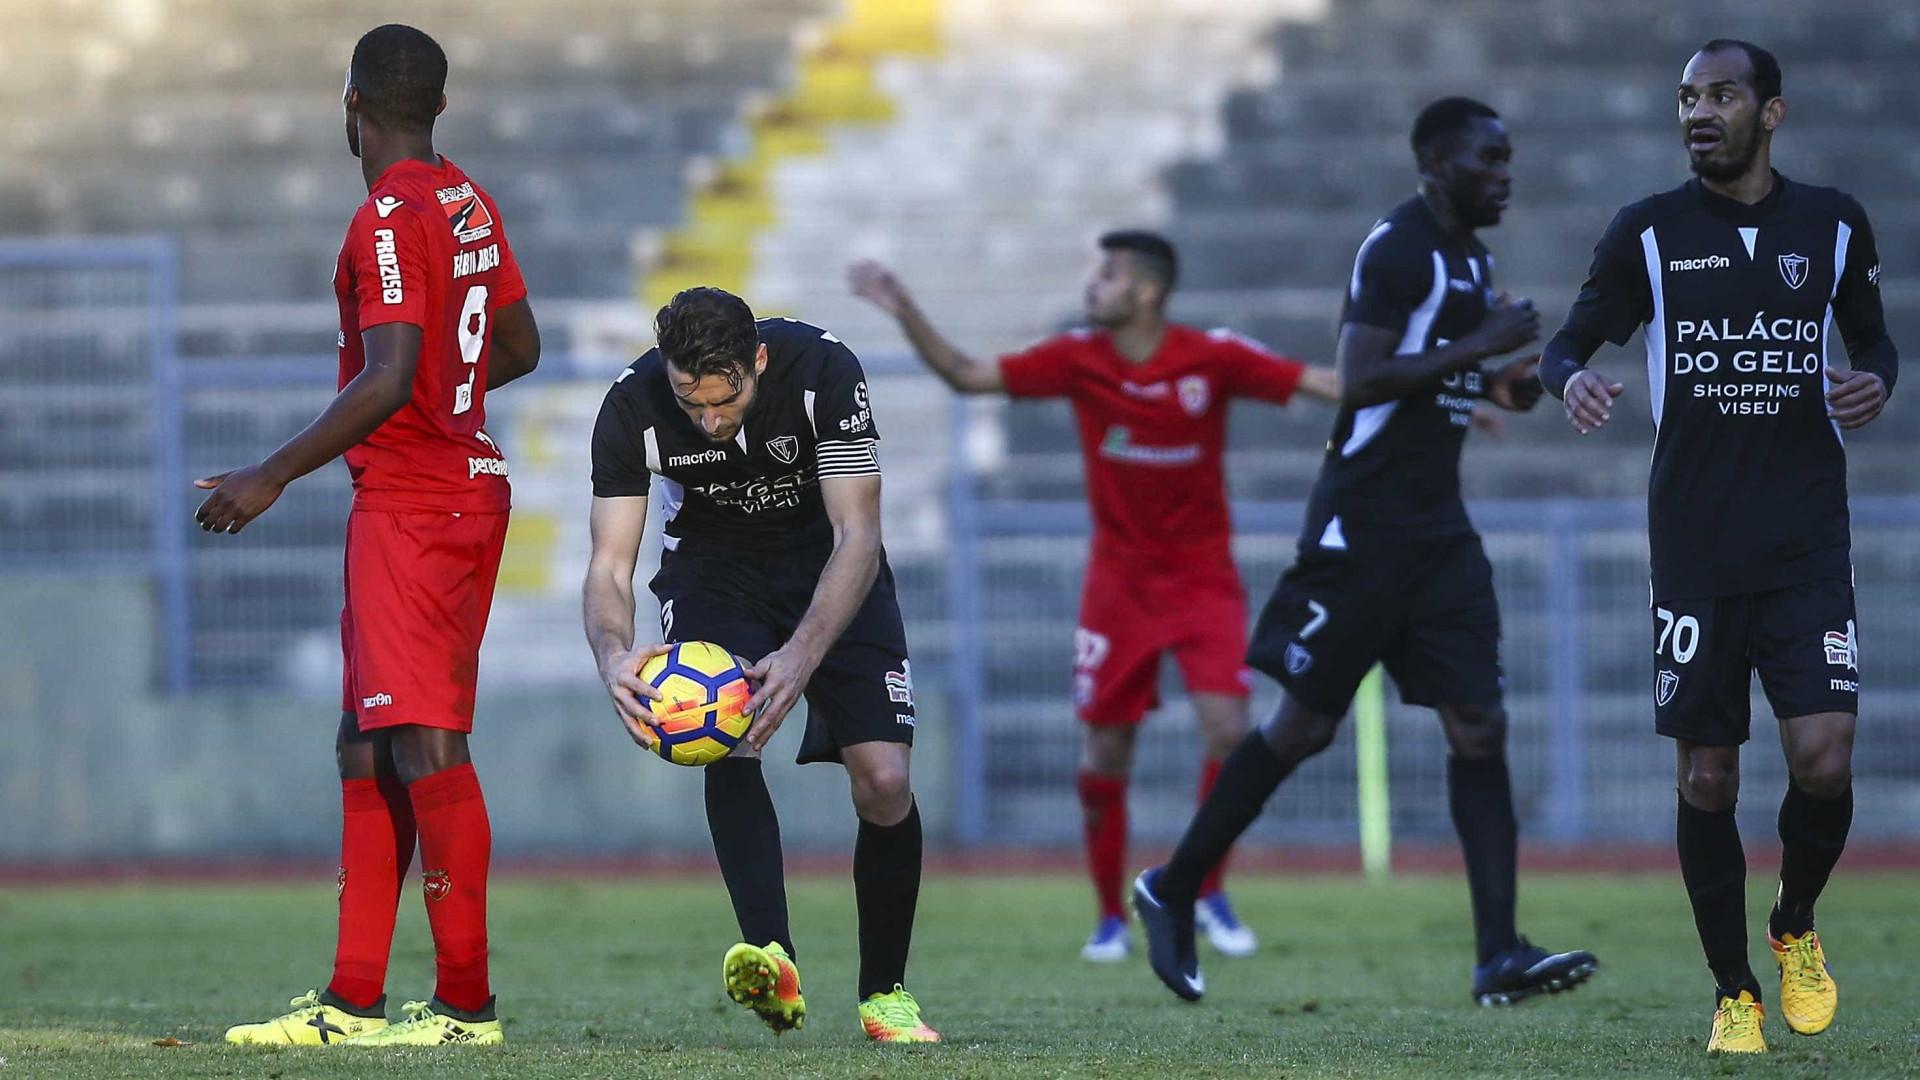 II Liga: Confira os resultados e marcadores da 20.ª jornada